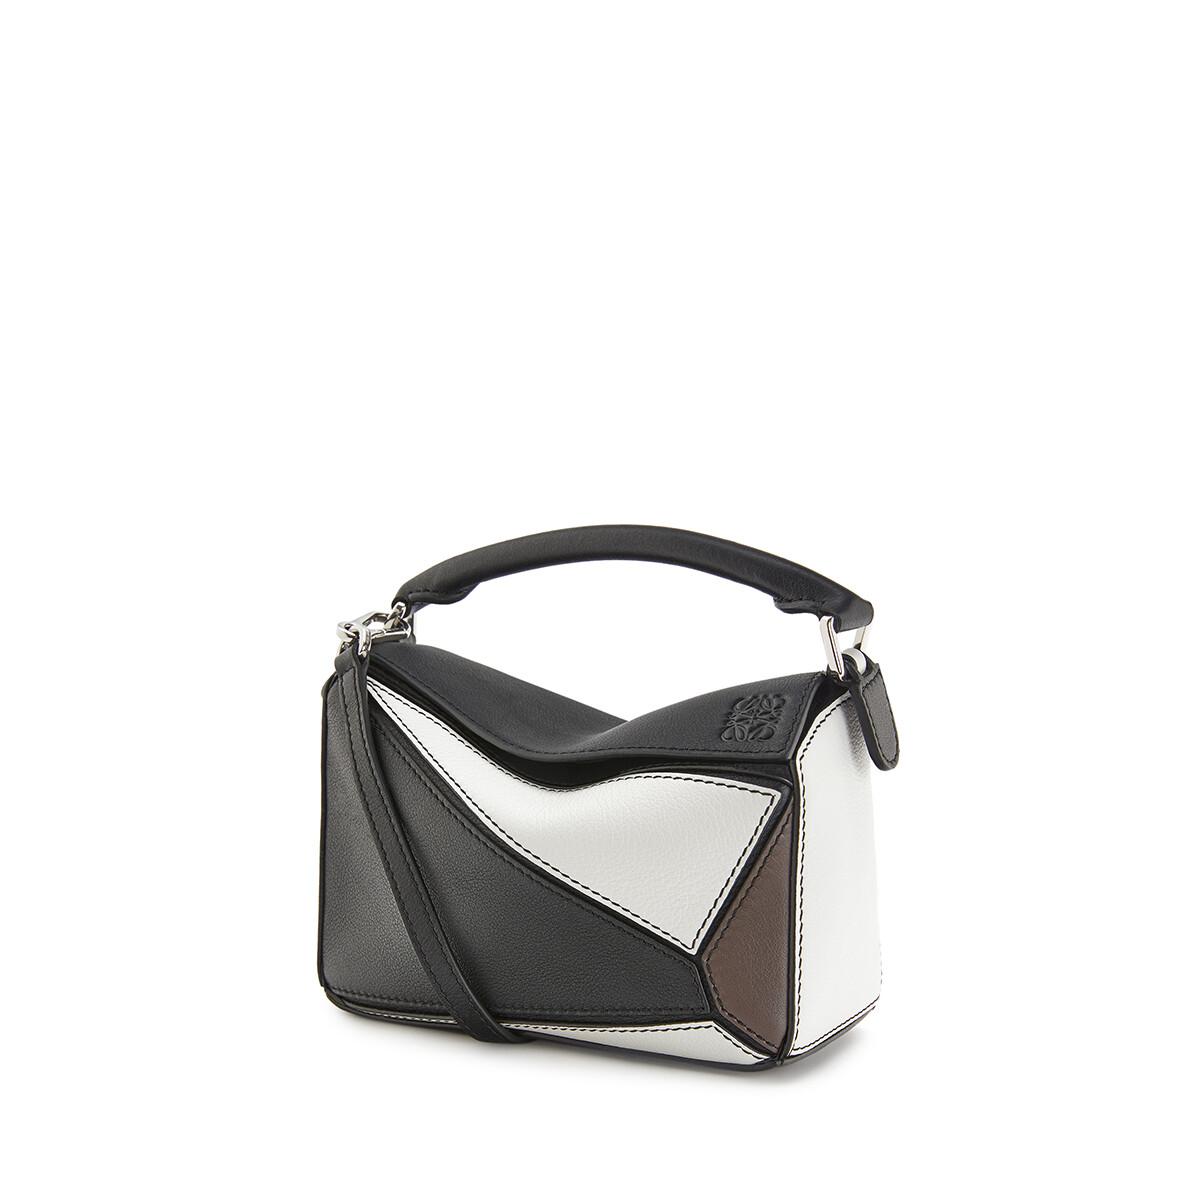 LOEWE Puzzle Mini Bag Black/Taupe front